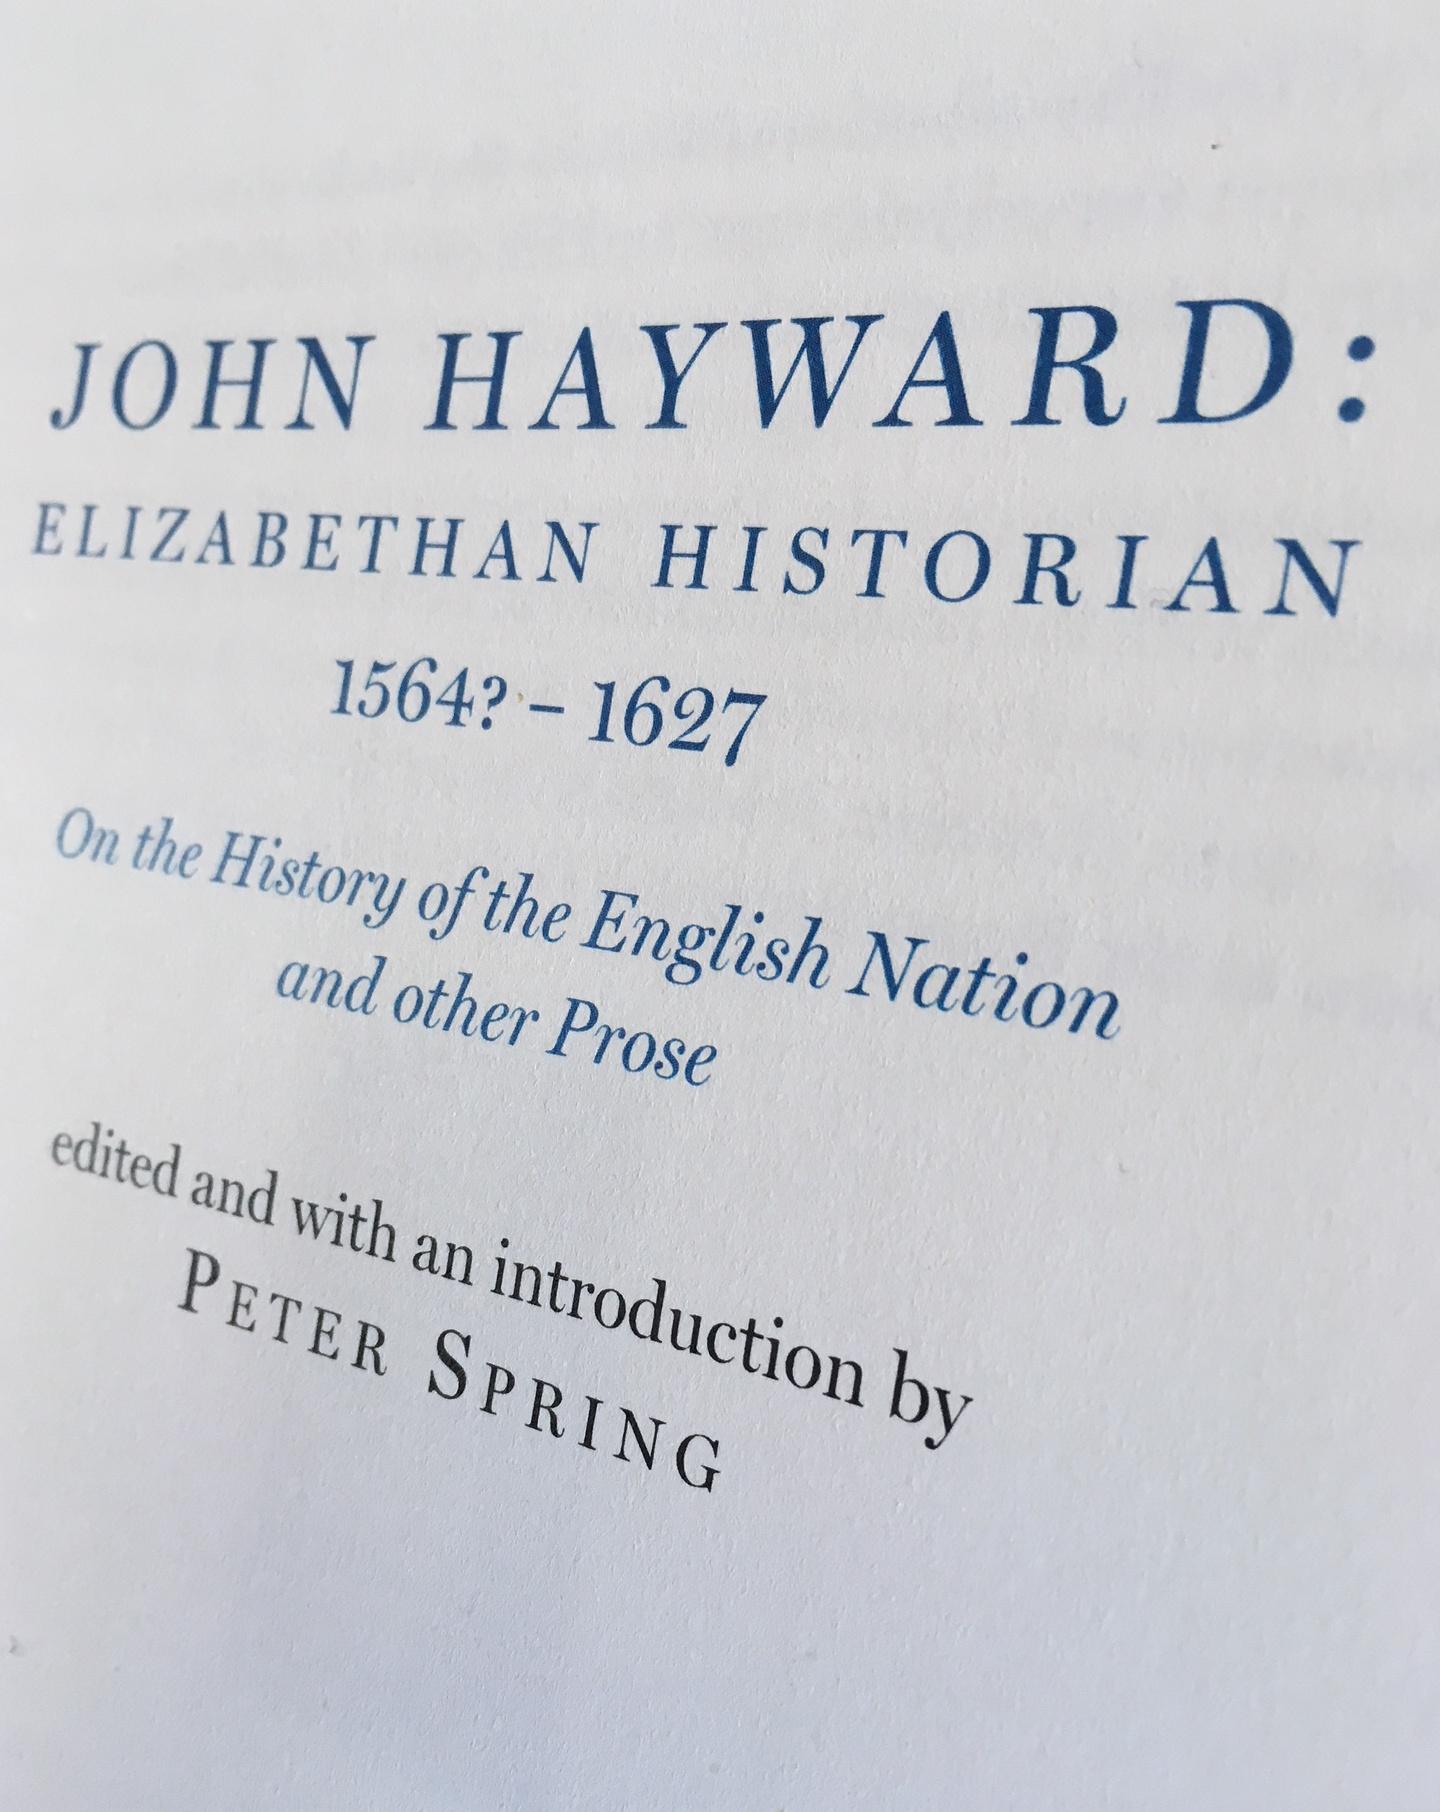 John Hayward: Elizabethan Historian